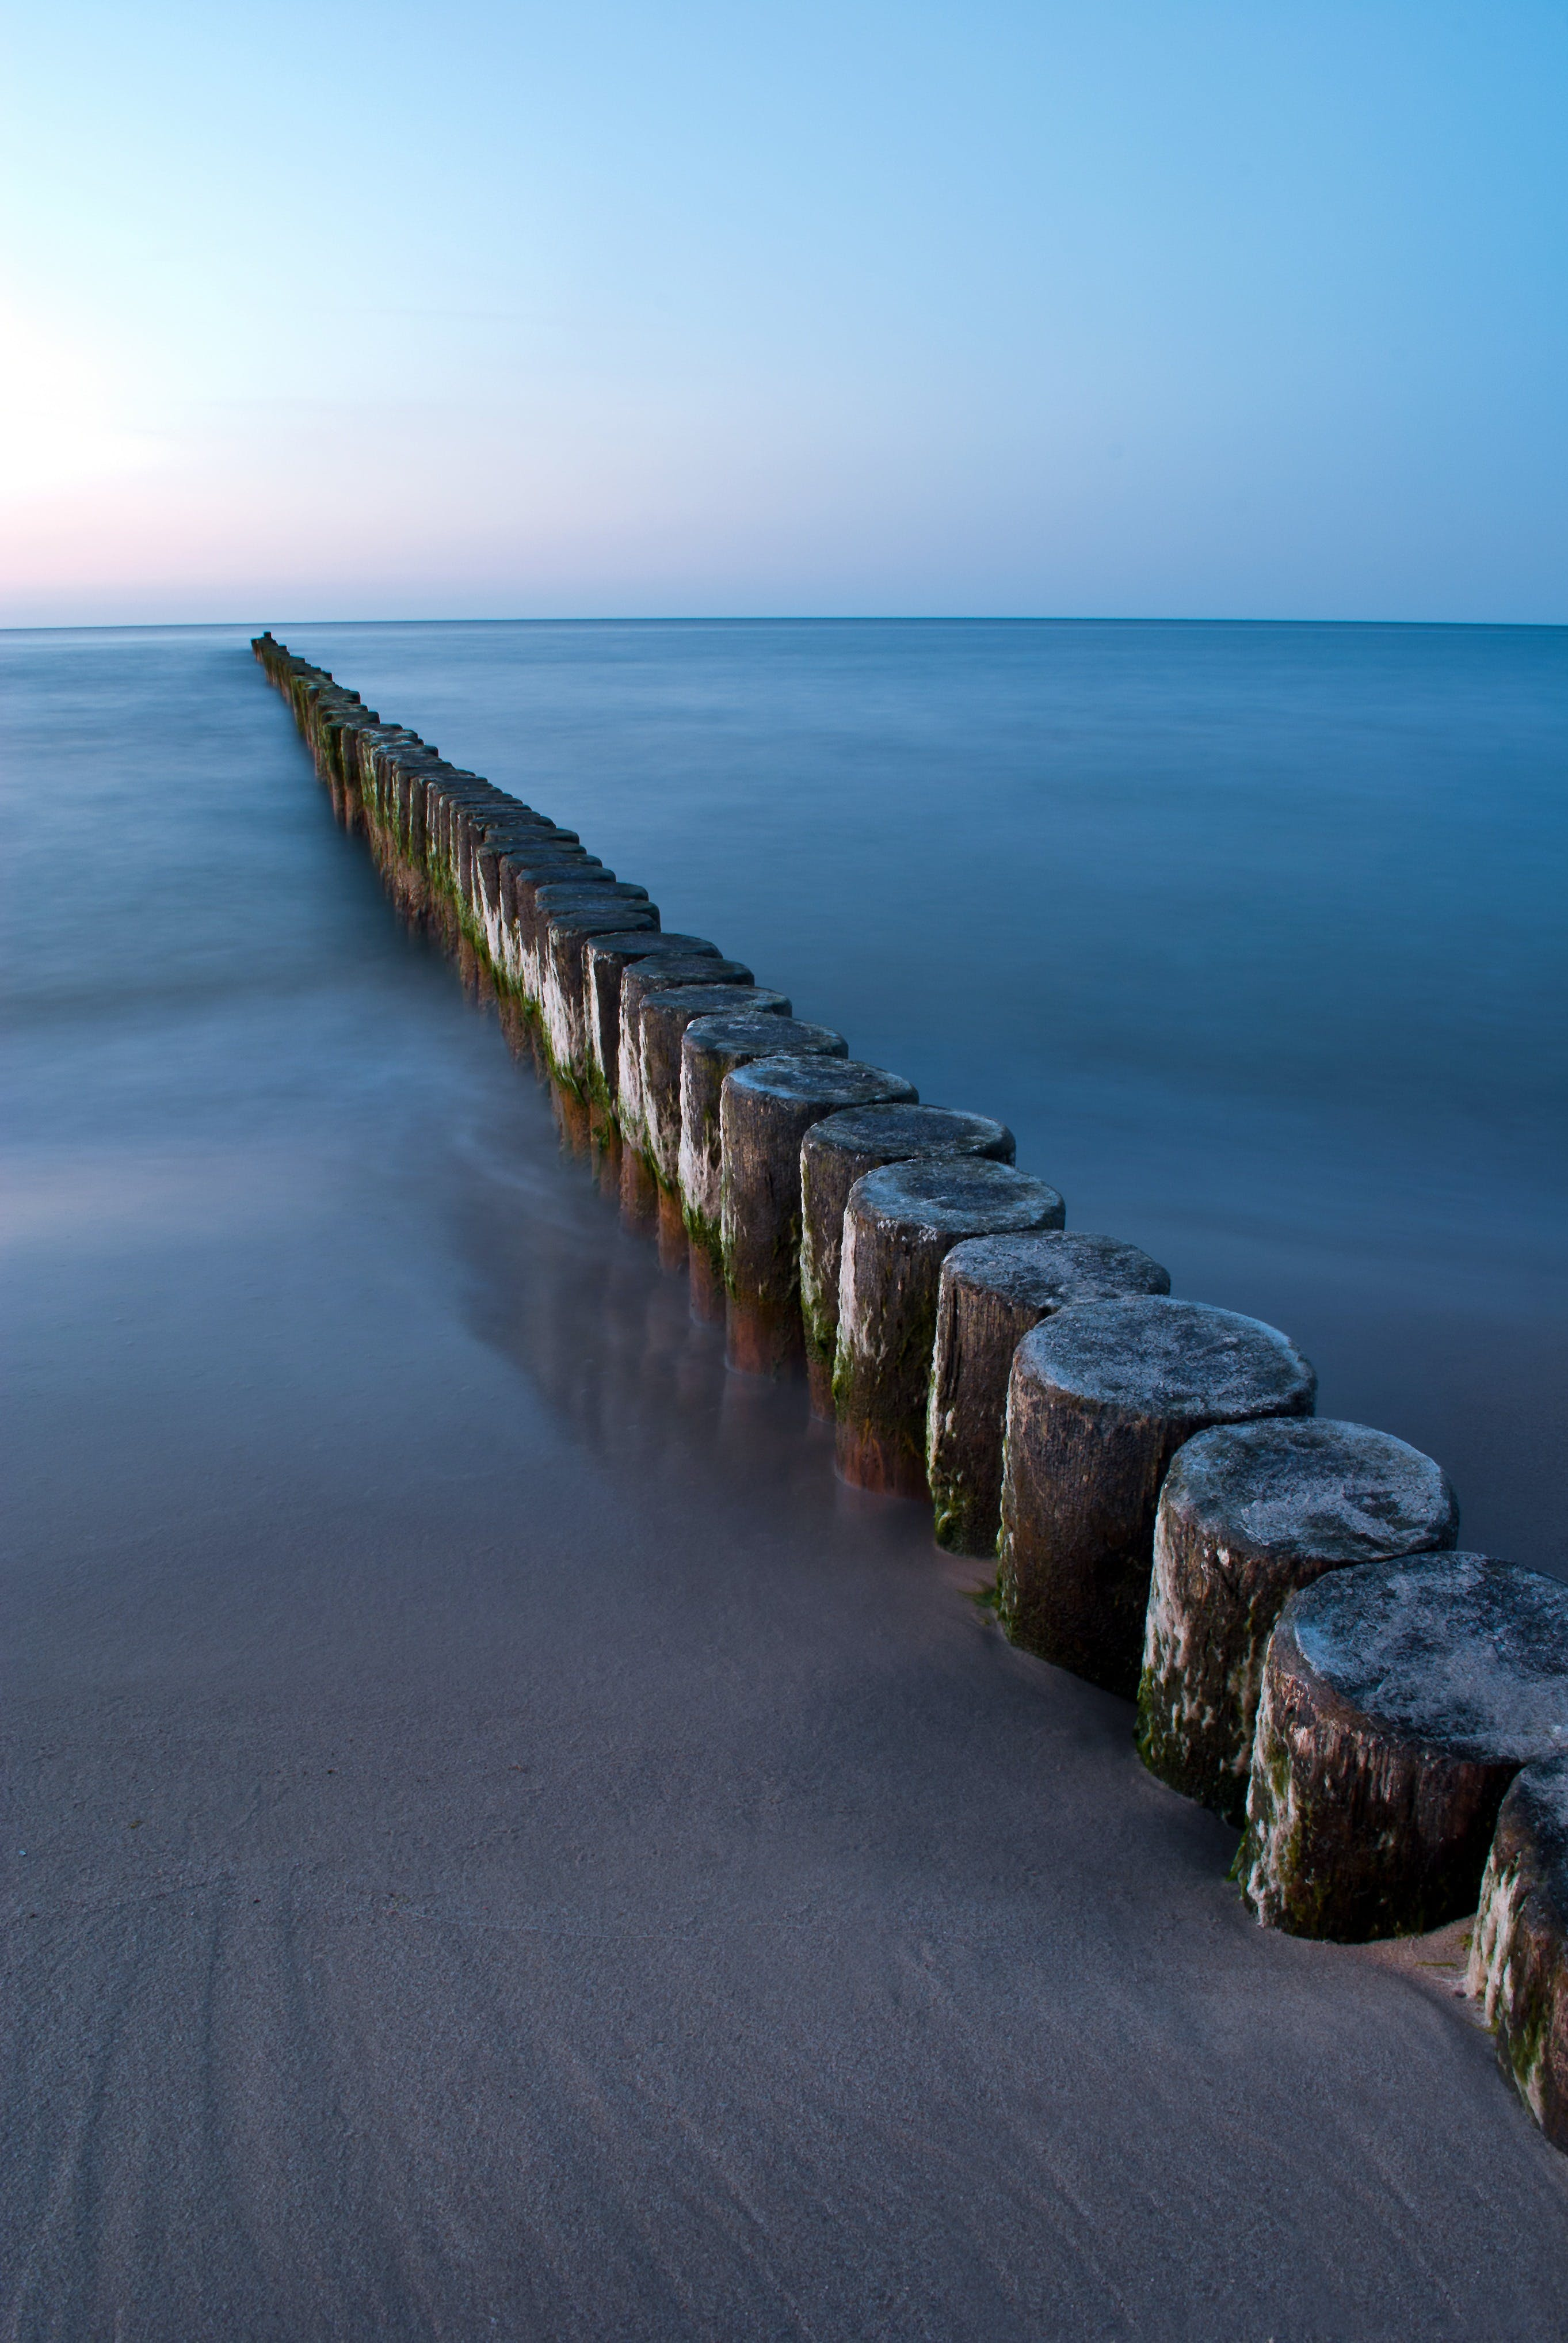 Sea Dock Poles